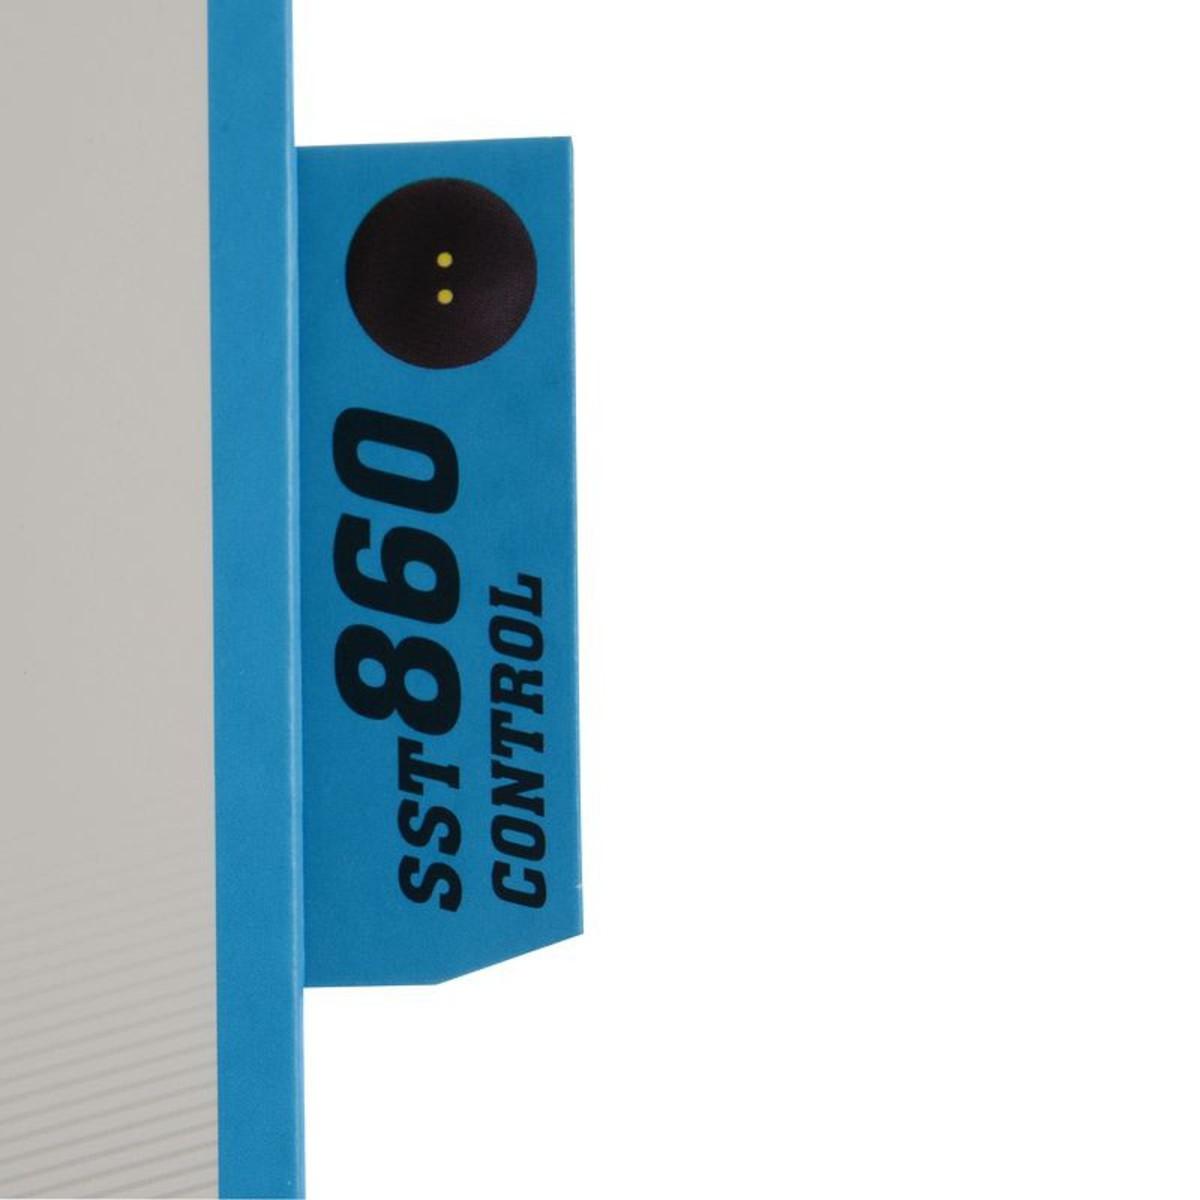 Bild 4 von Squashsaite SST860 1,26 mm 9.70 m blau ARTENGO